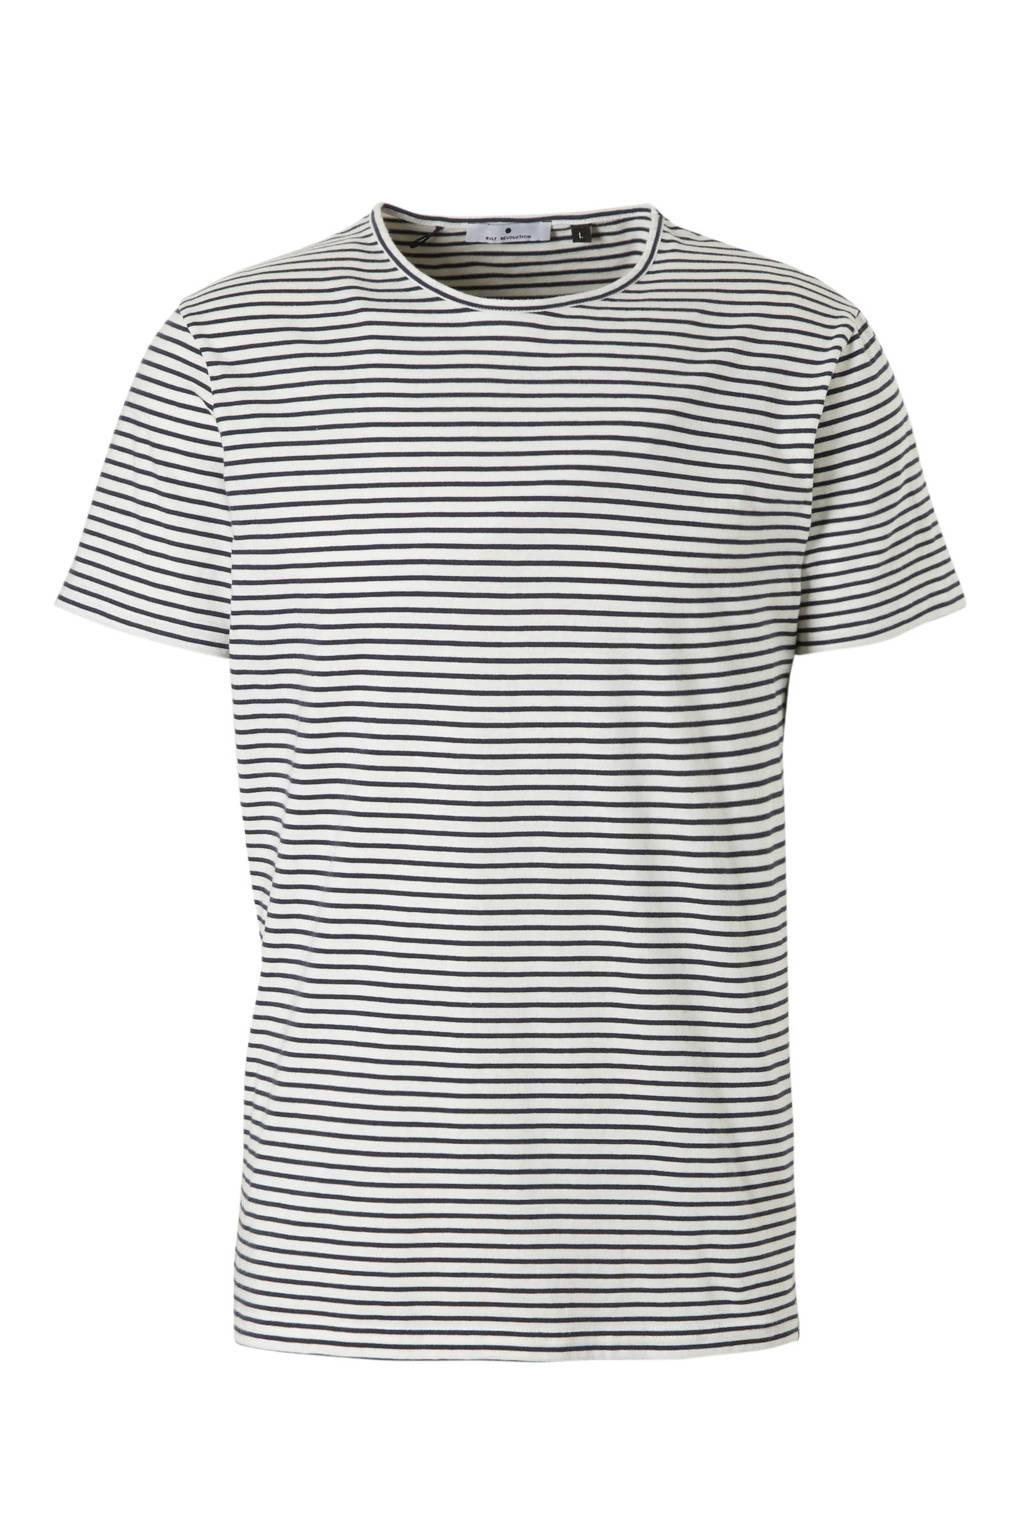 RVLT gestreept T-shirt wit, Wit/marine